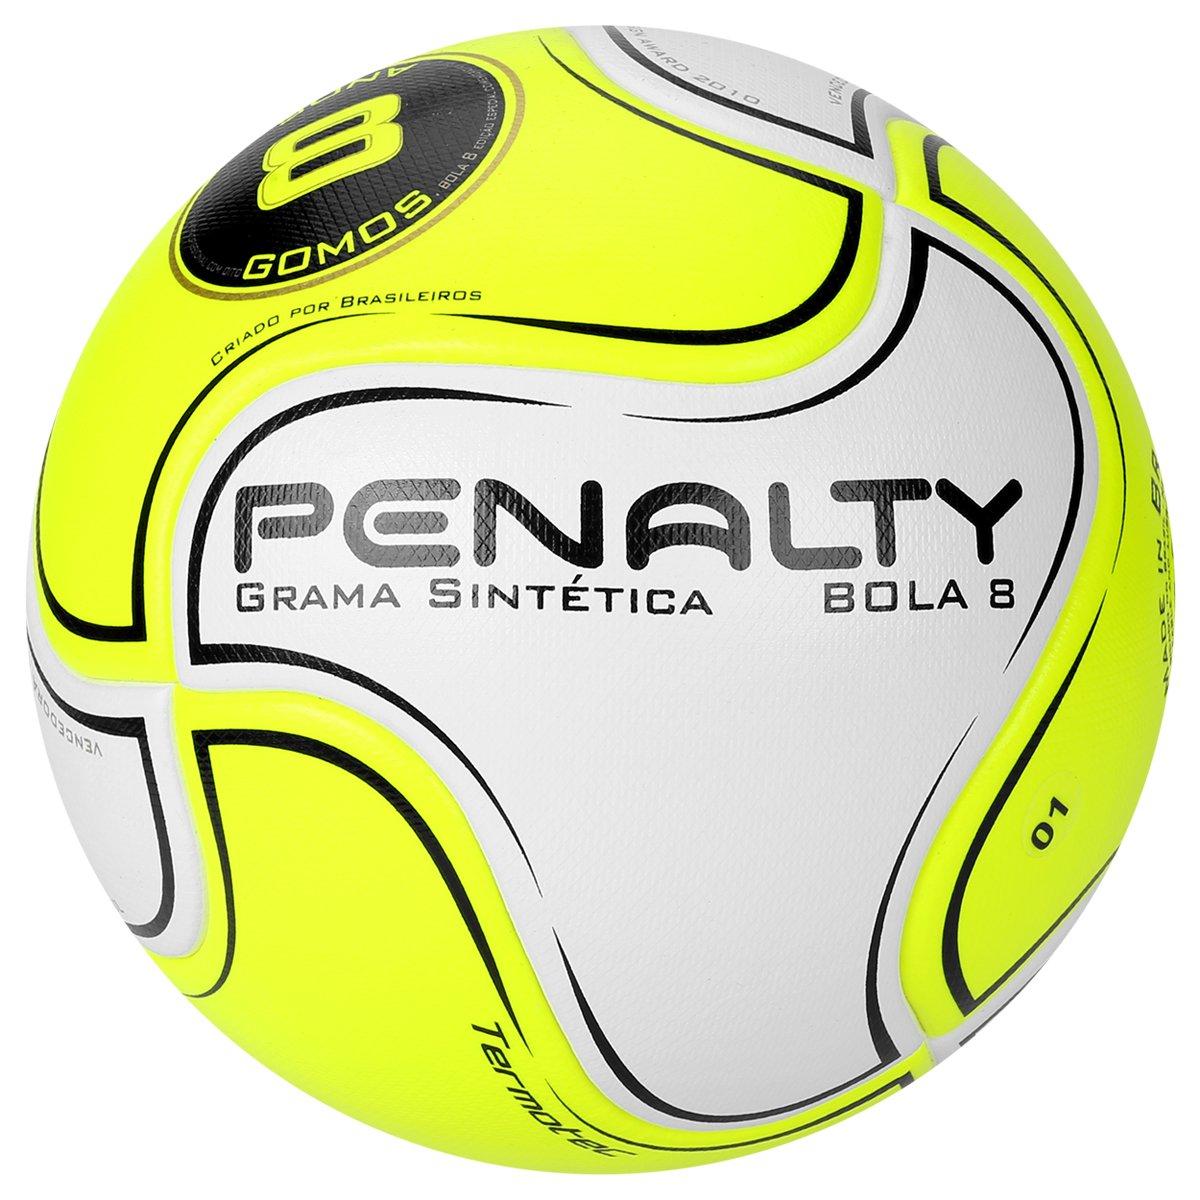 4fa2b7fa2f Bola Futebol Penalty 8 S11 R1 Kick Off 6 Society - Compre Agora ...